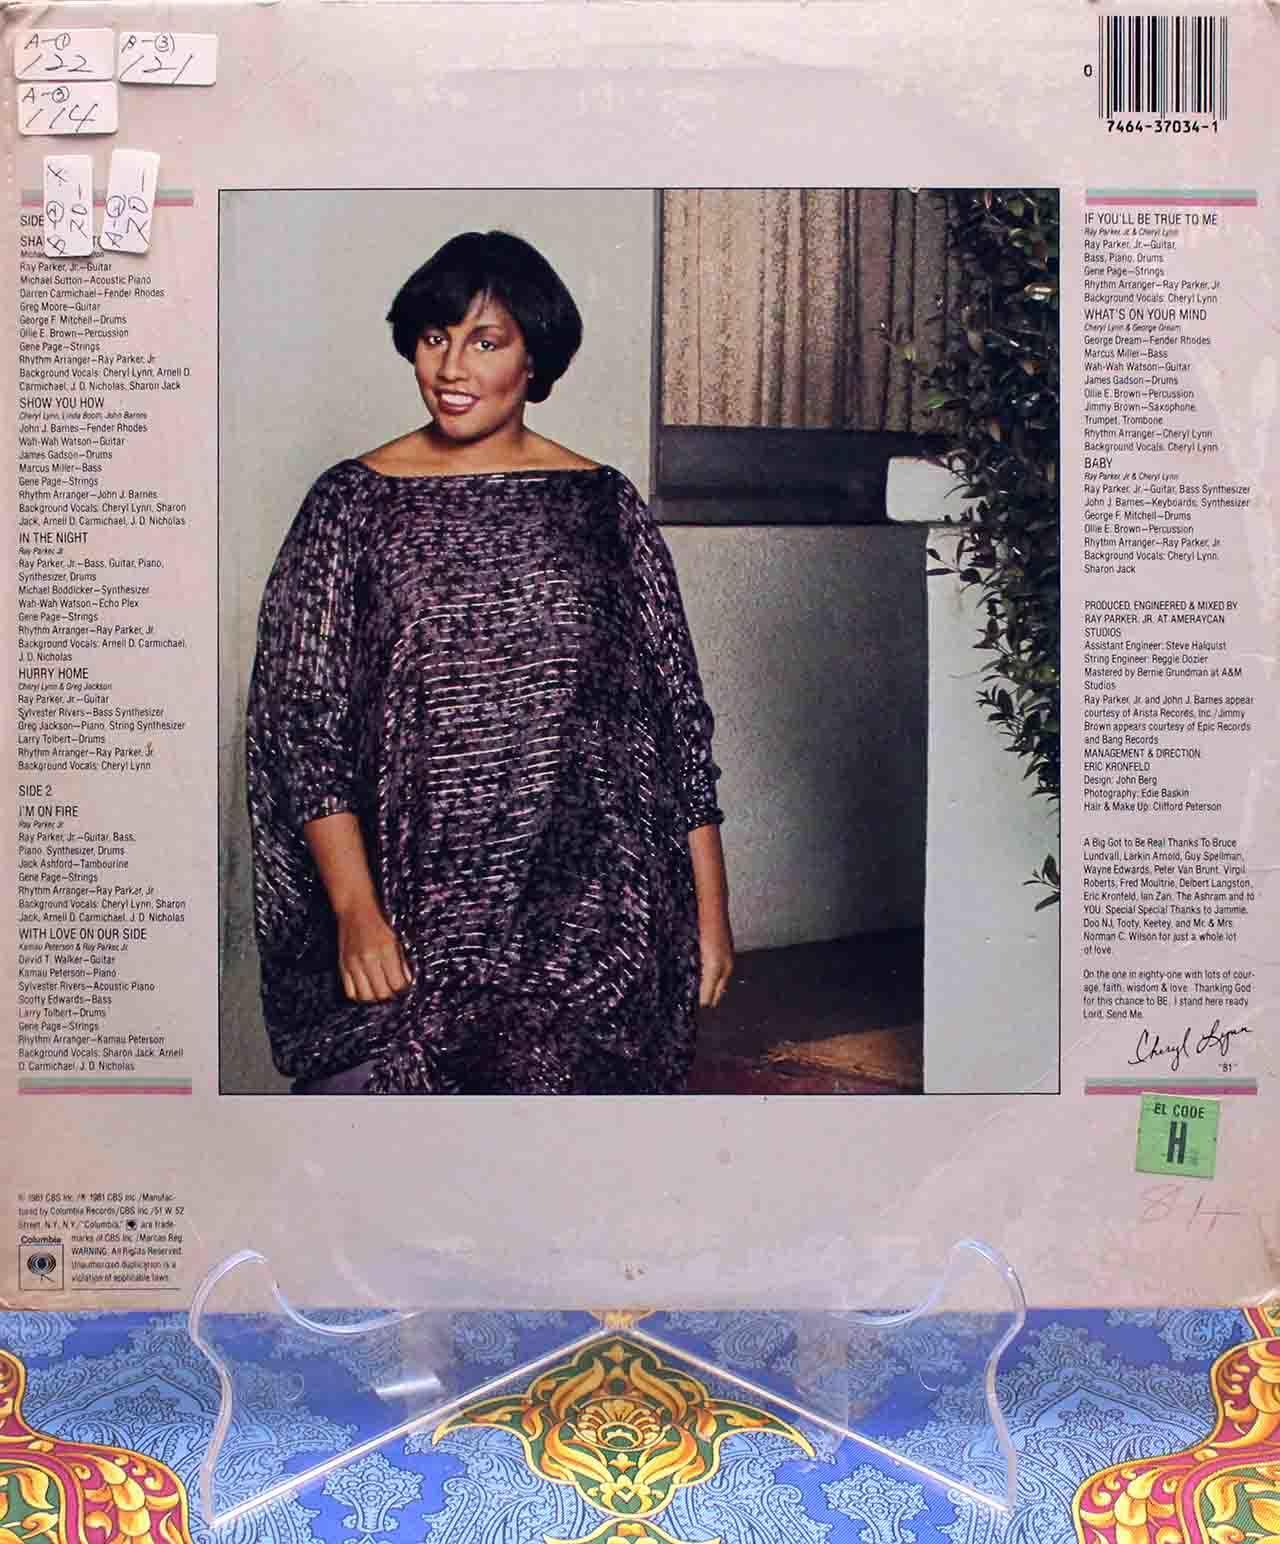 Cheryl Lynn – In The Night LP 02